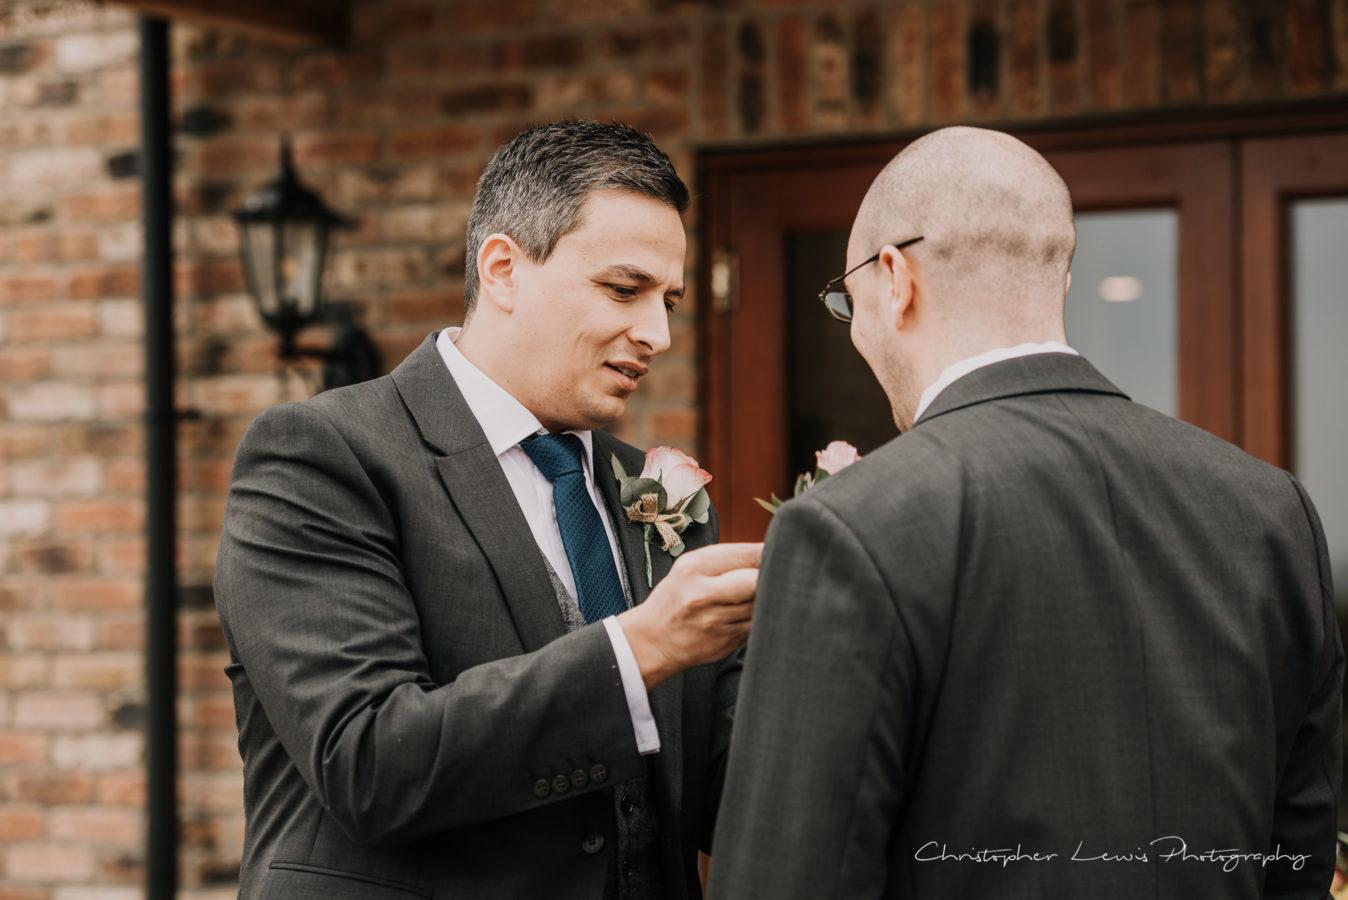 Thief-Hall-Wedding-Christopher-Lewis-Photography-11